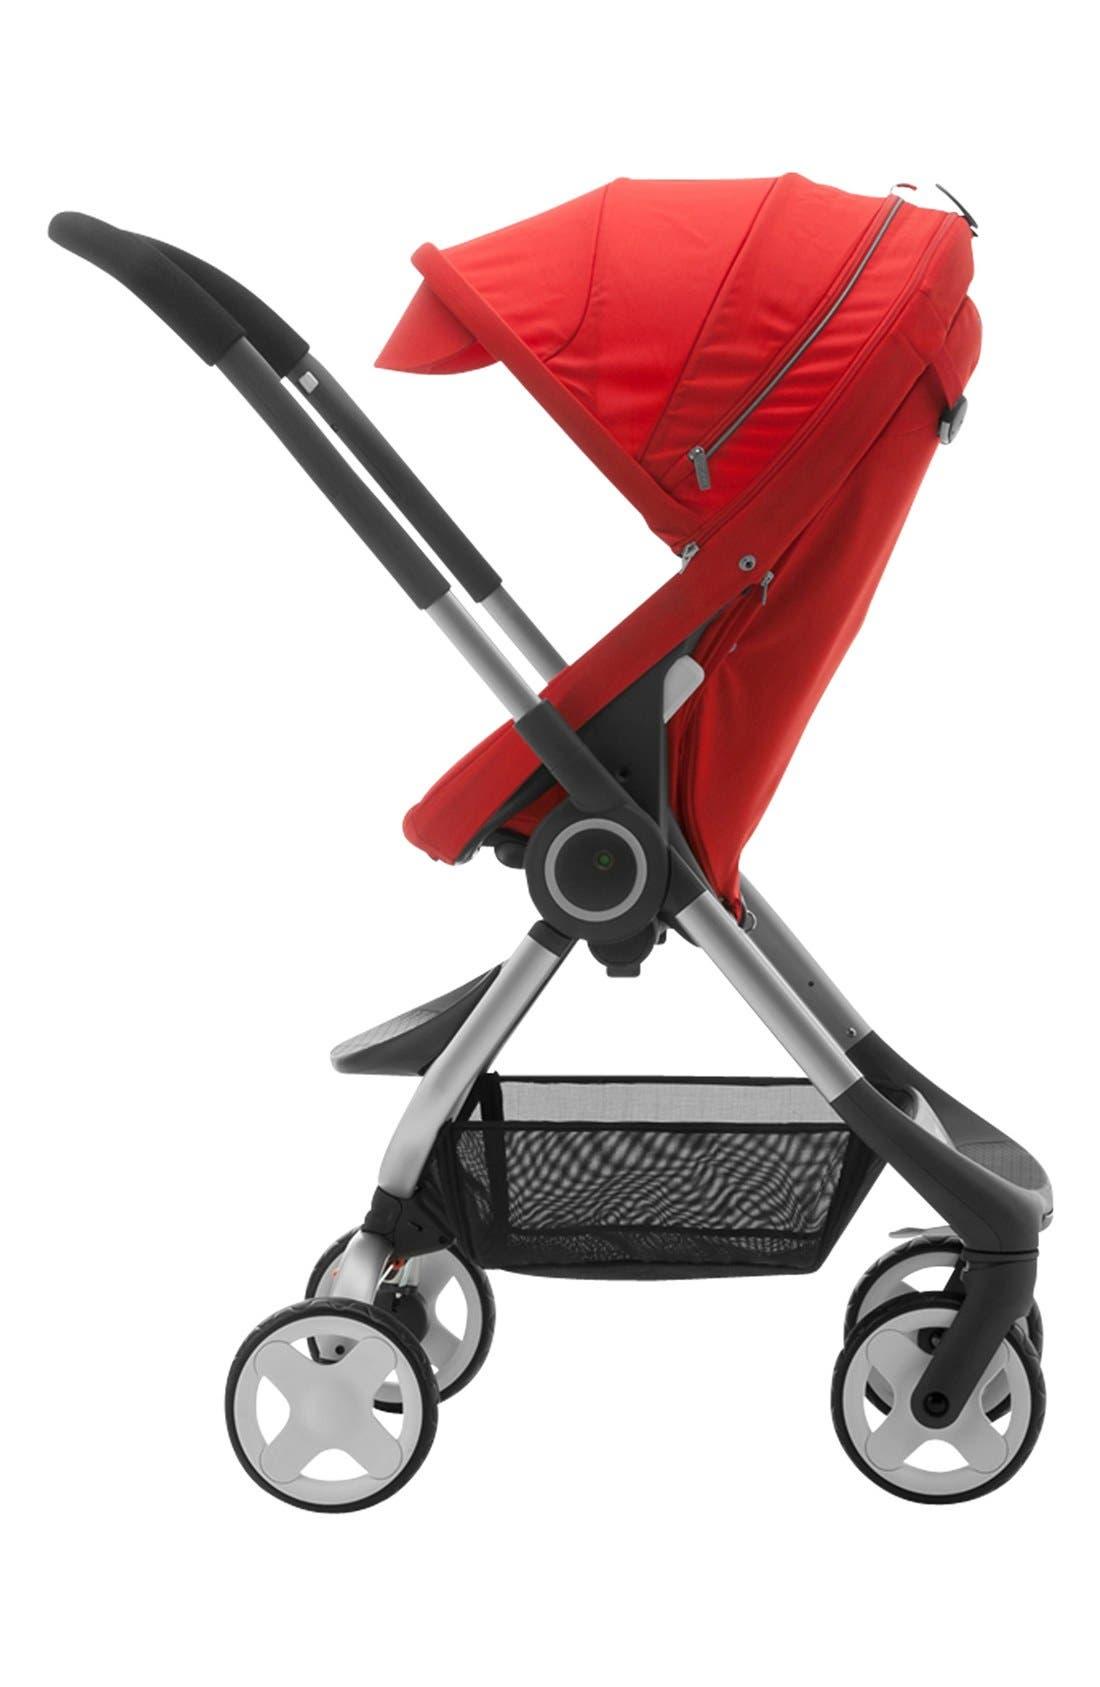 Alternate Image 1 Selected - Stokke 'Scoot Us' Stroller